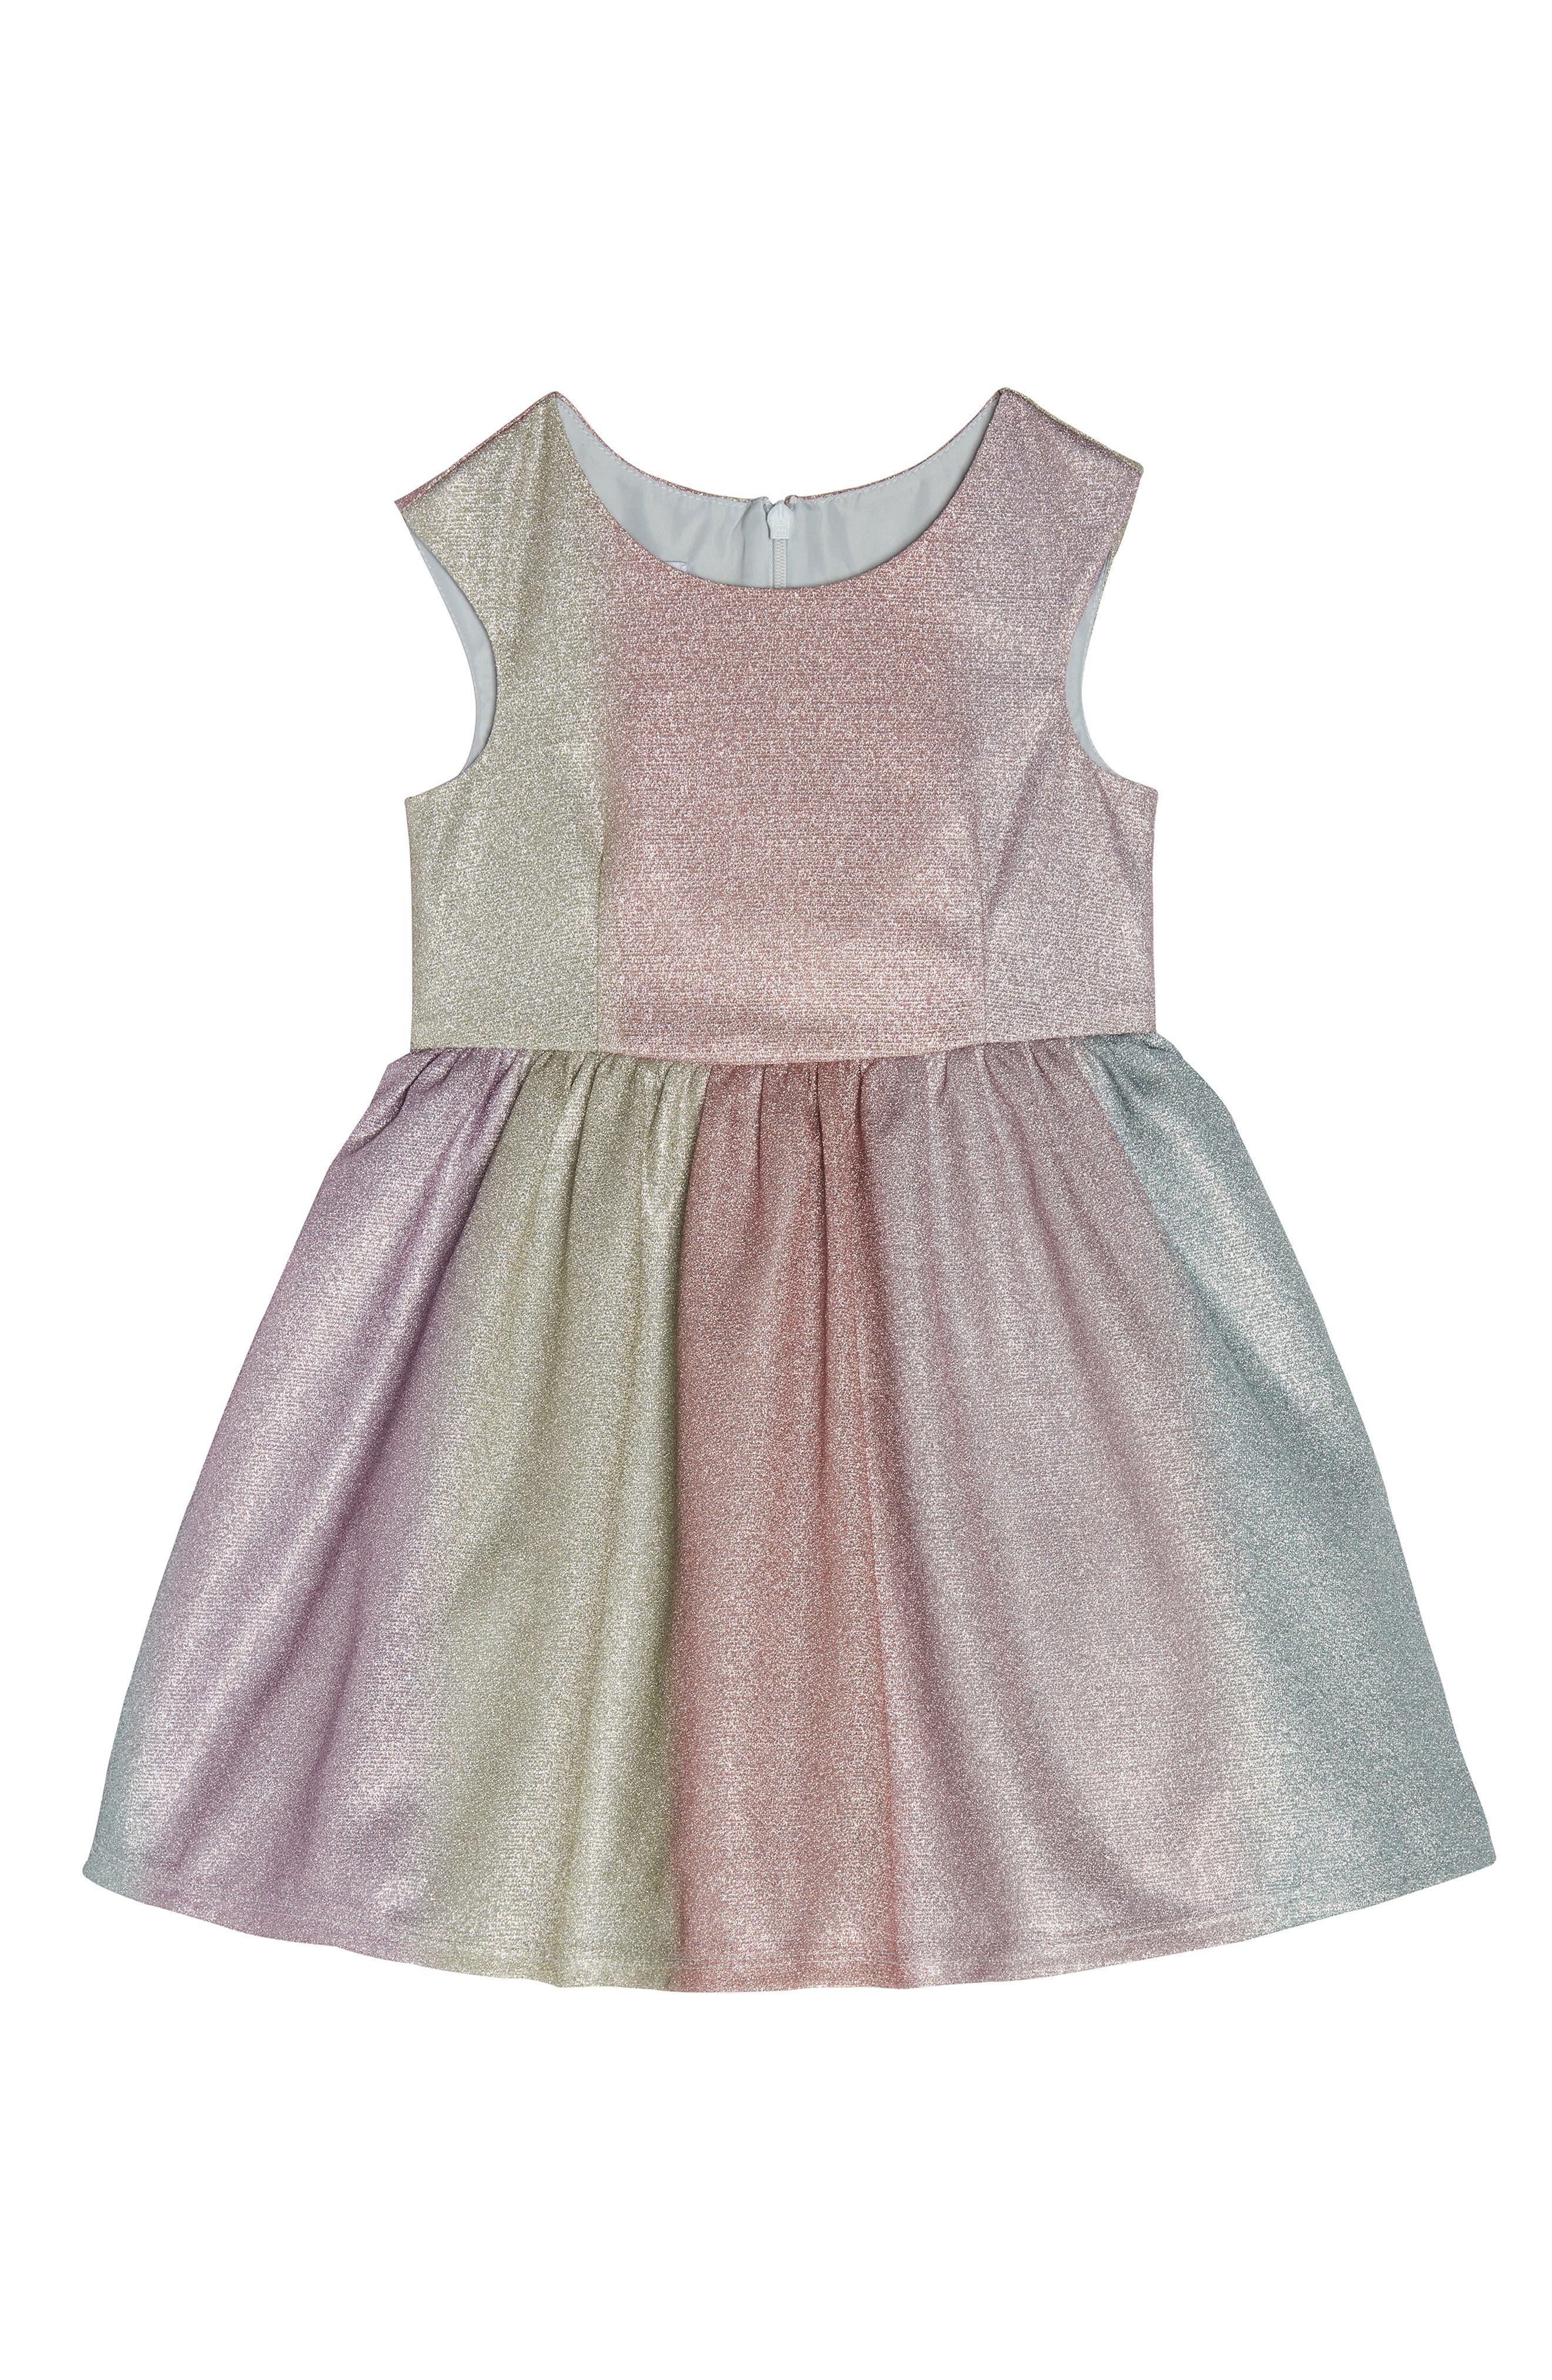 Girl Outfit,Glitter Dress Toddler Personalized Bohemian Dress Love Purple Glitter Fringe Dress,Flowers Boho Girls Clothes